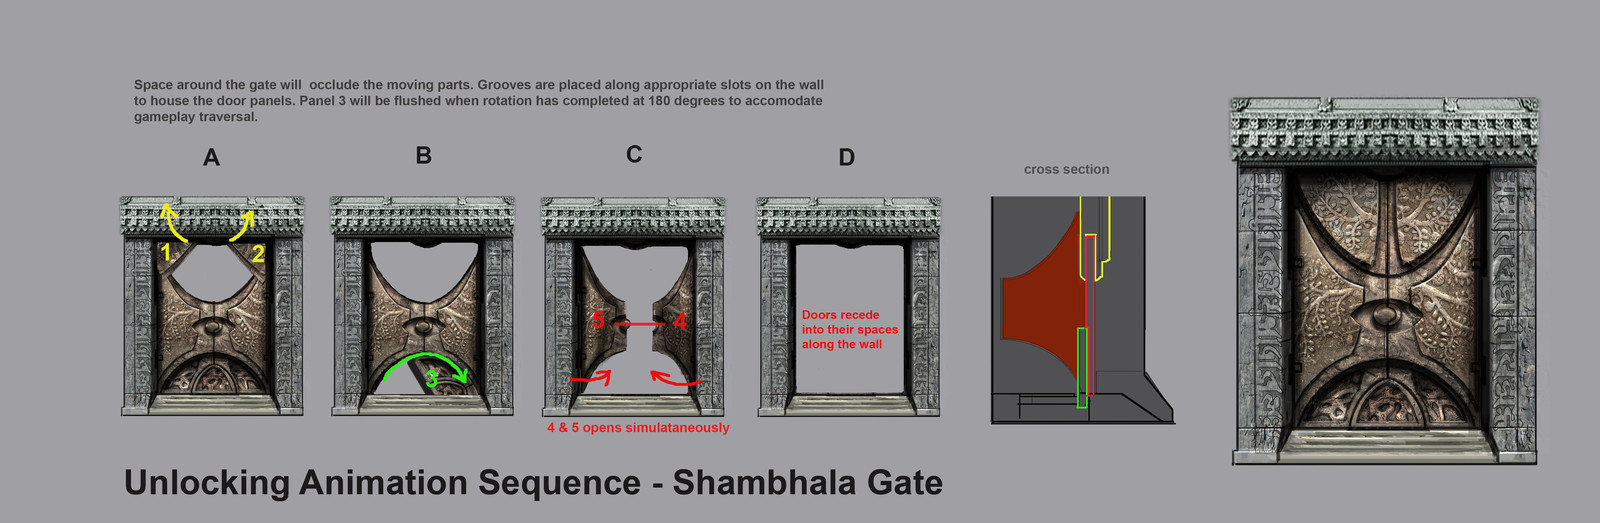 Shambhala gate opening design and mechanics sheet